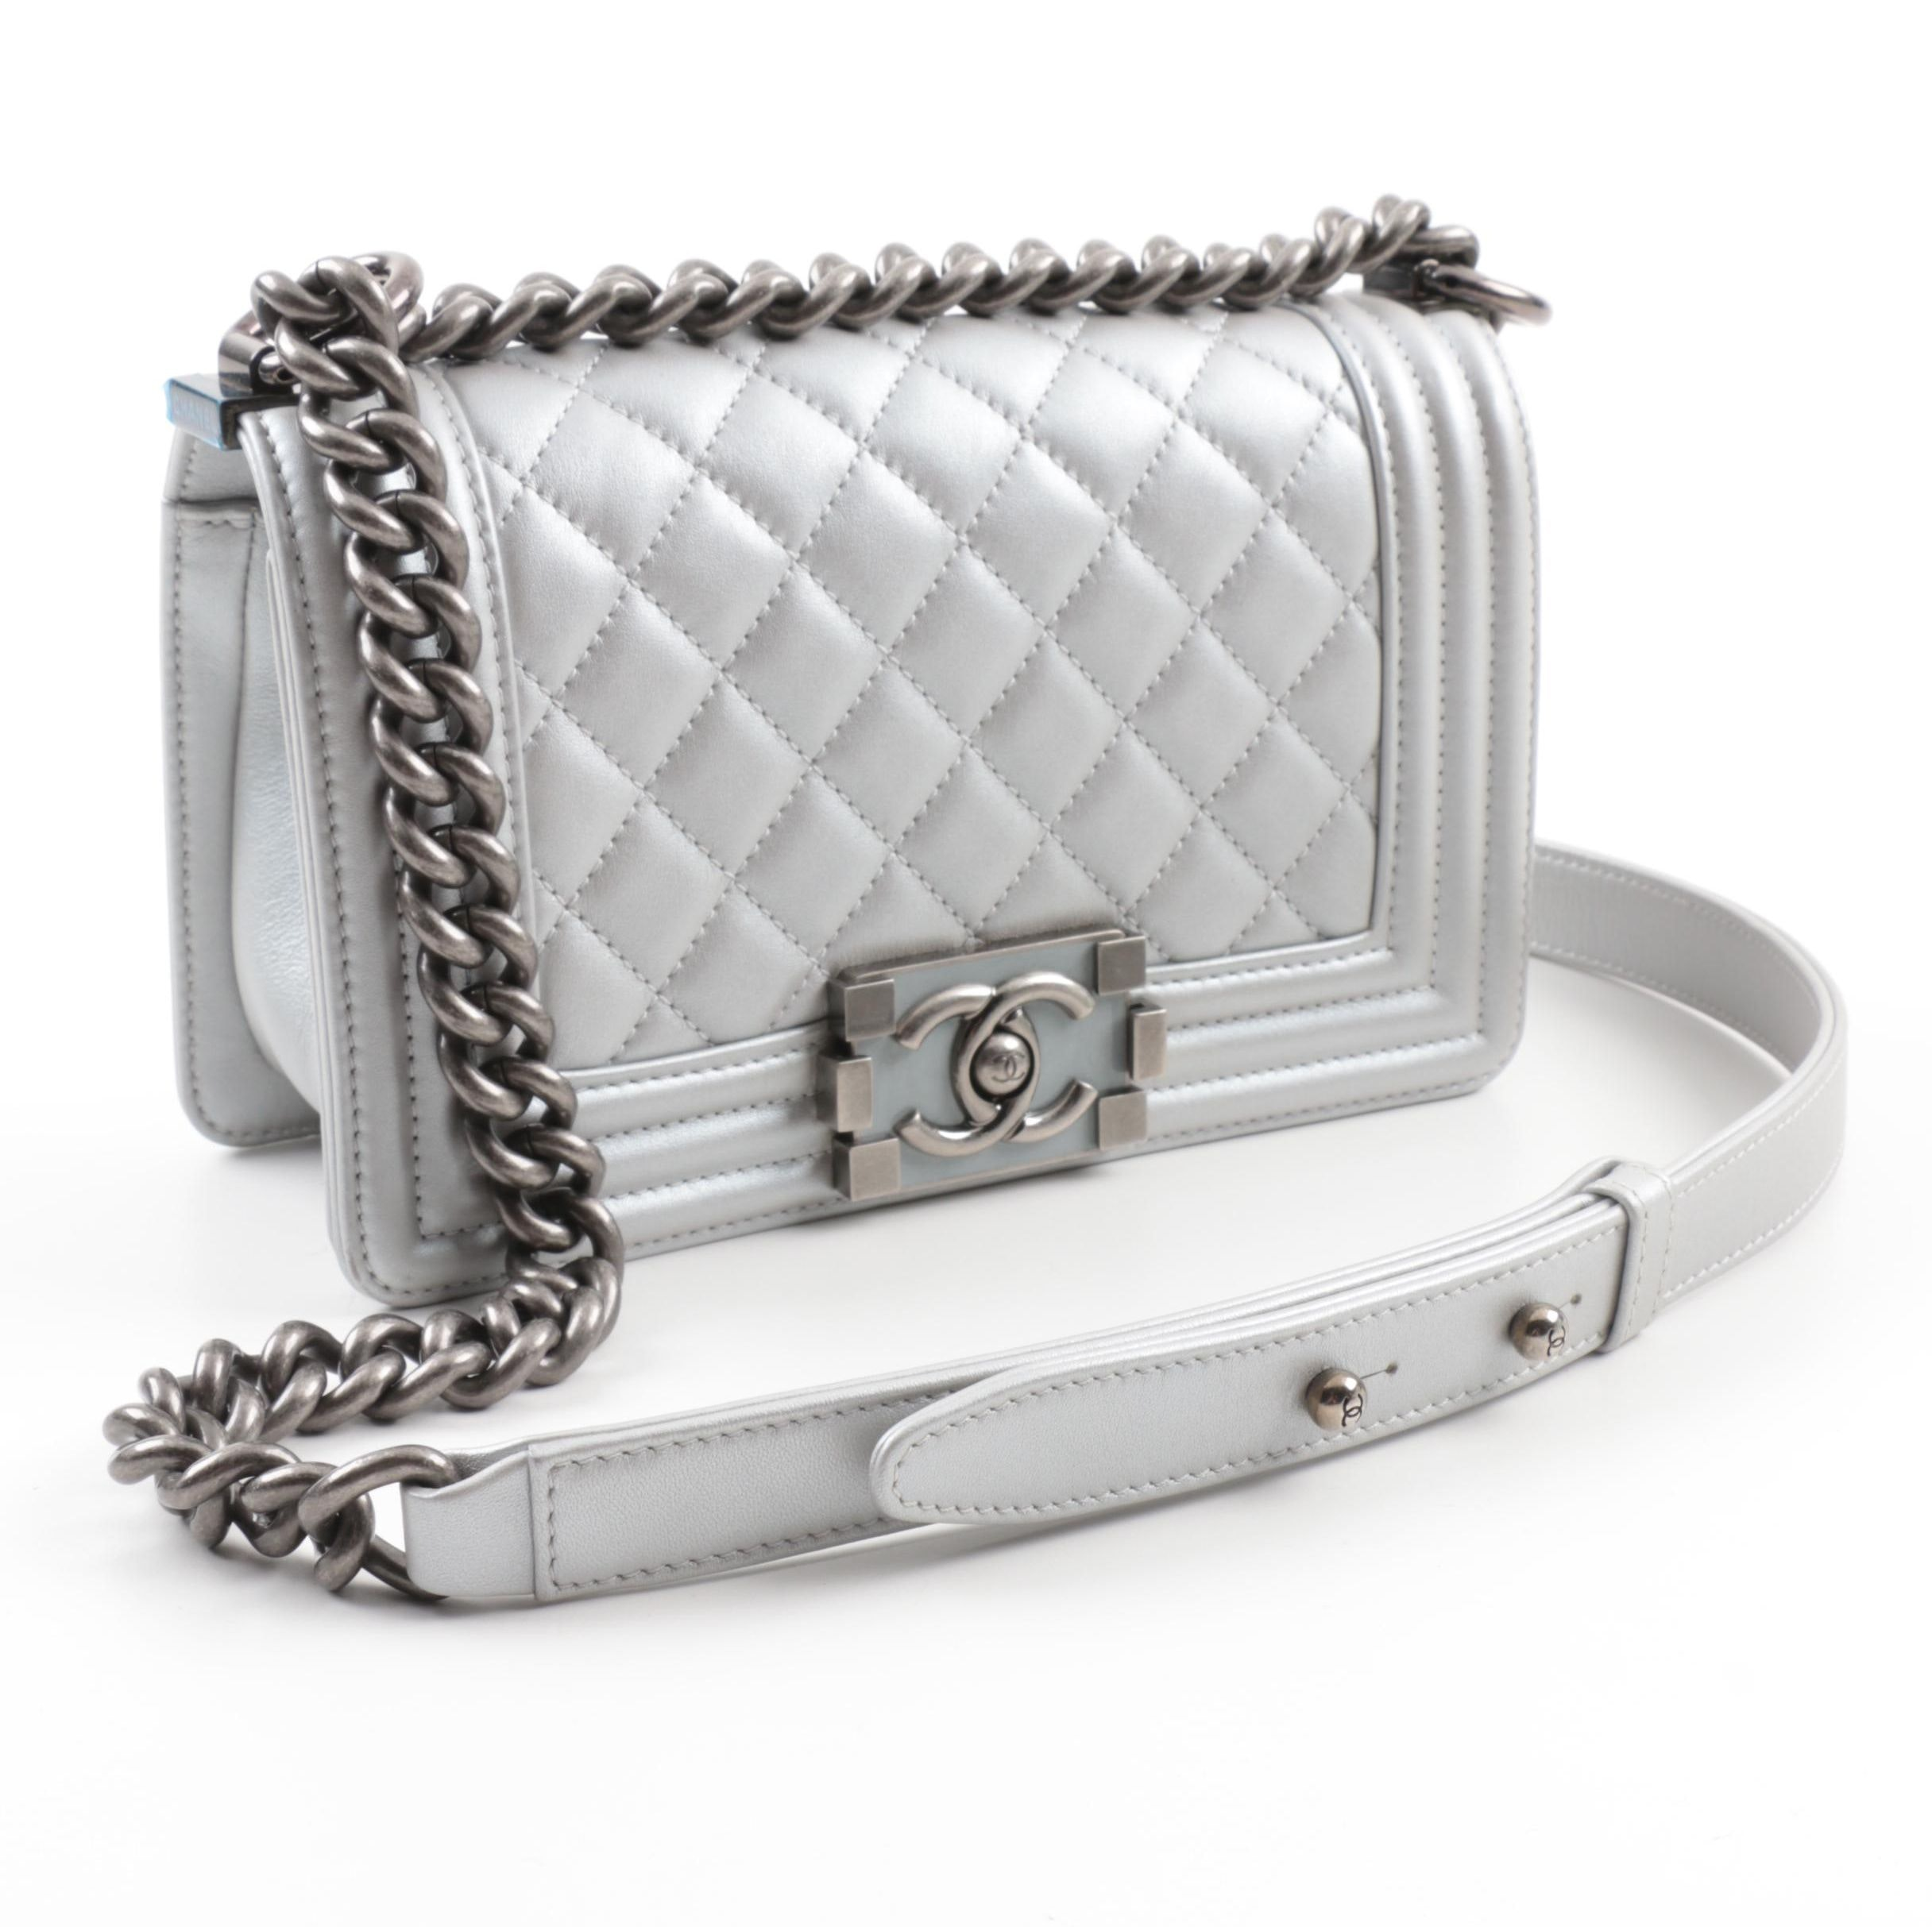 2014 Chanel Silver Metallic Calfskin Crossbody Boy Bag with Ruthenium Hardware